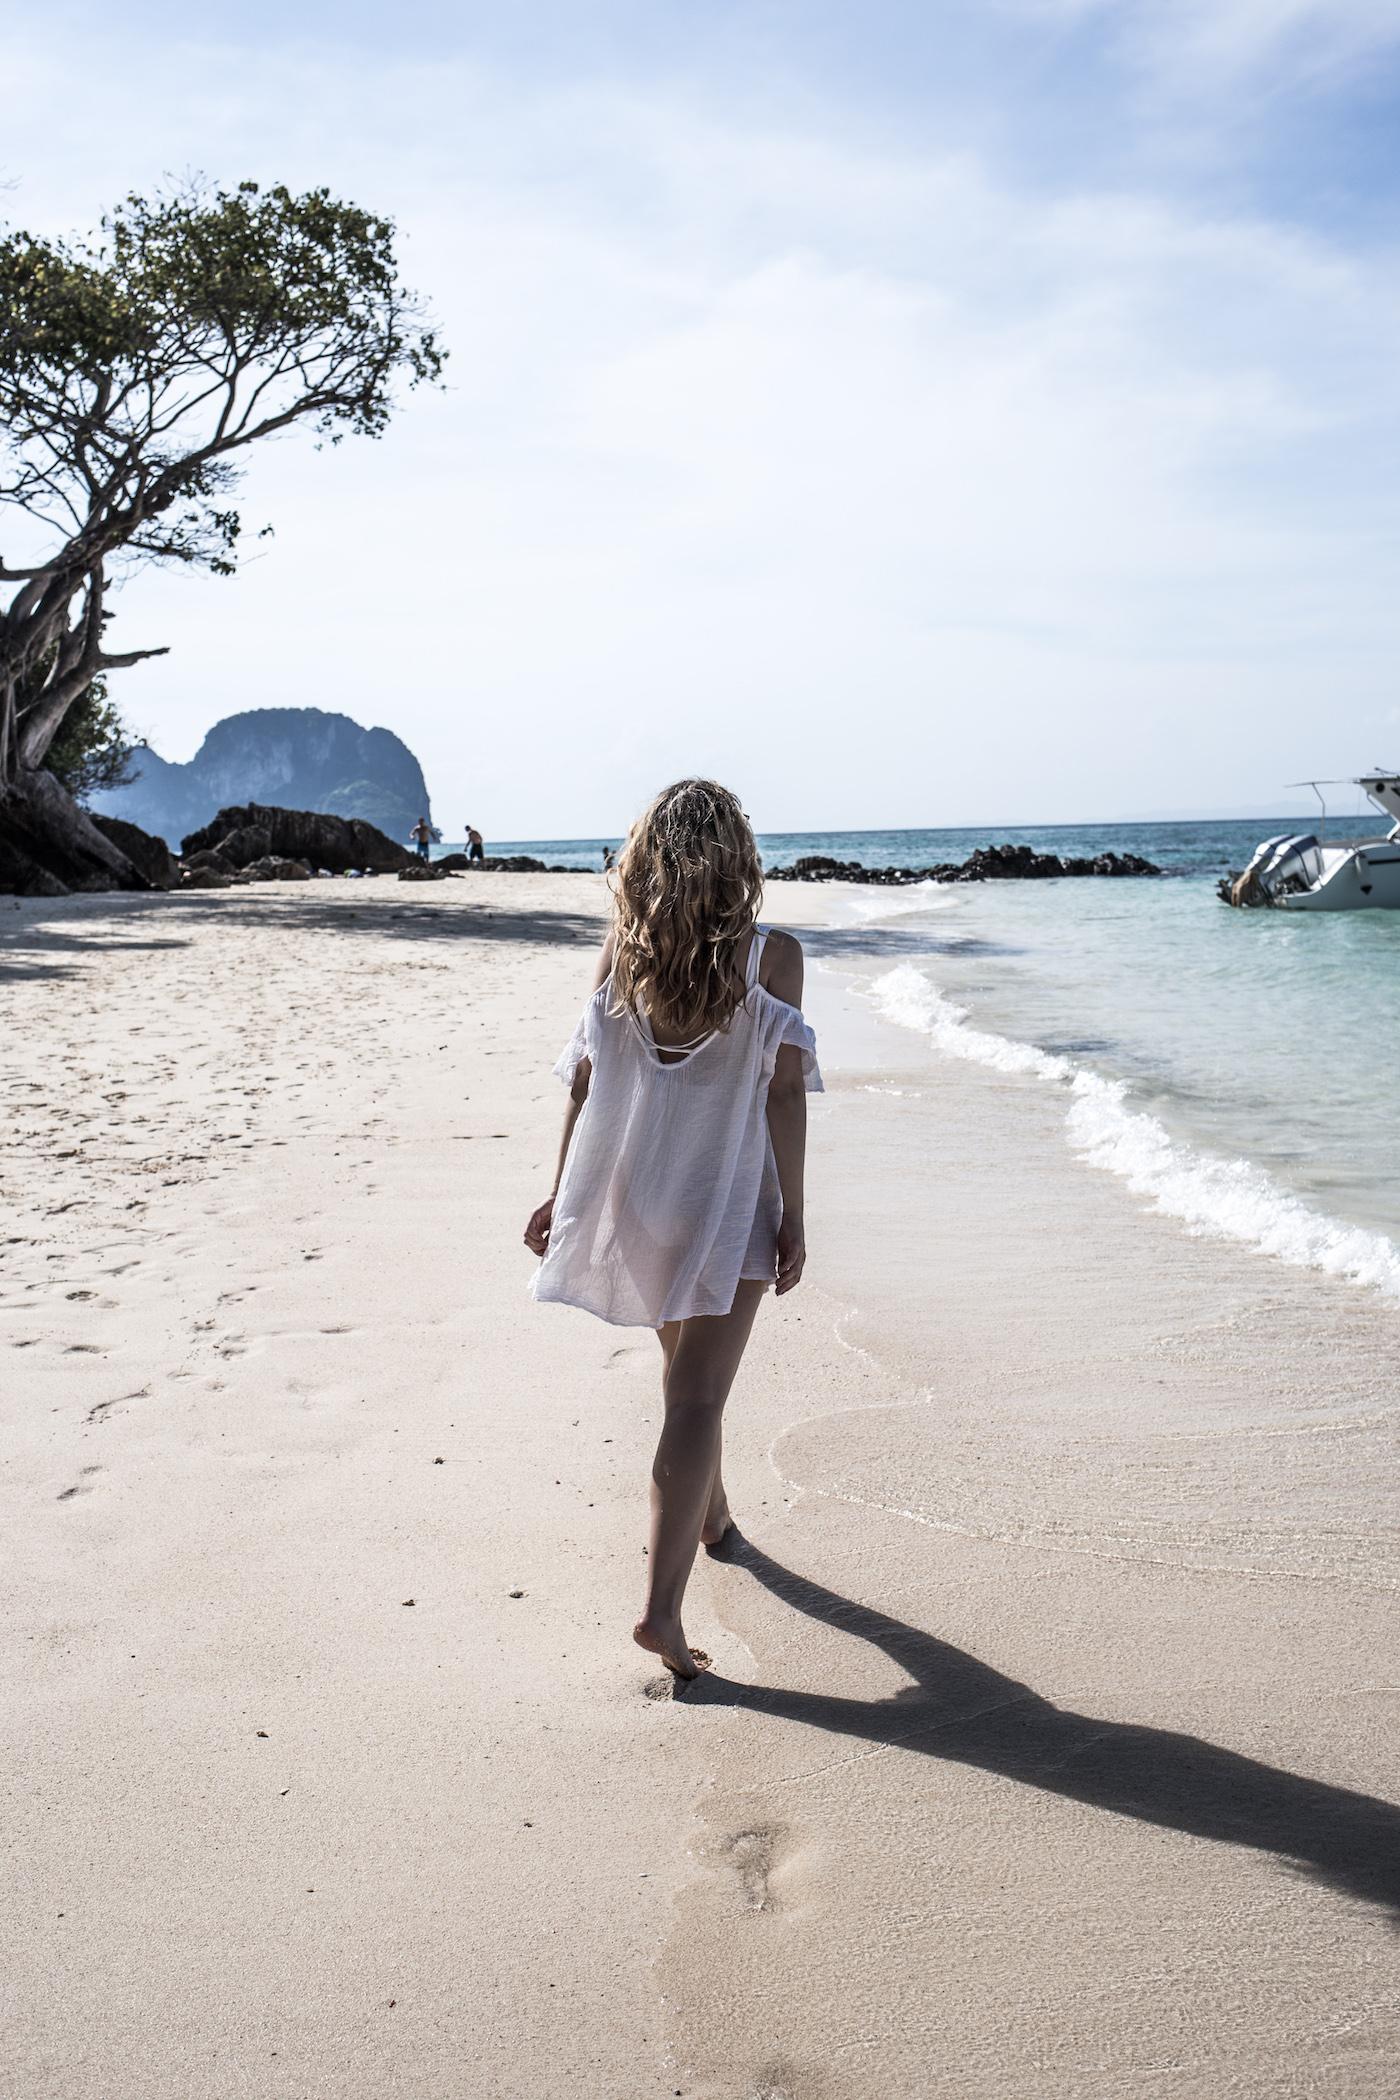 Best Beaches in Krabi Want Get Repeat Blog